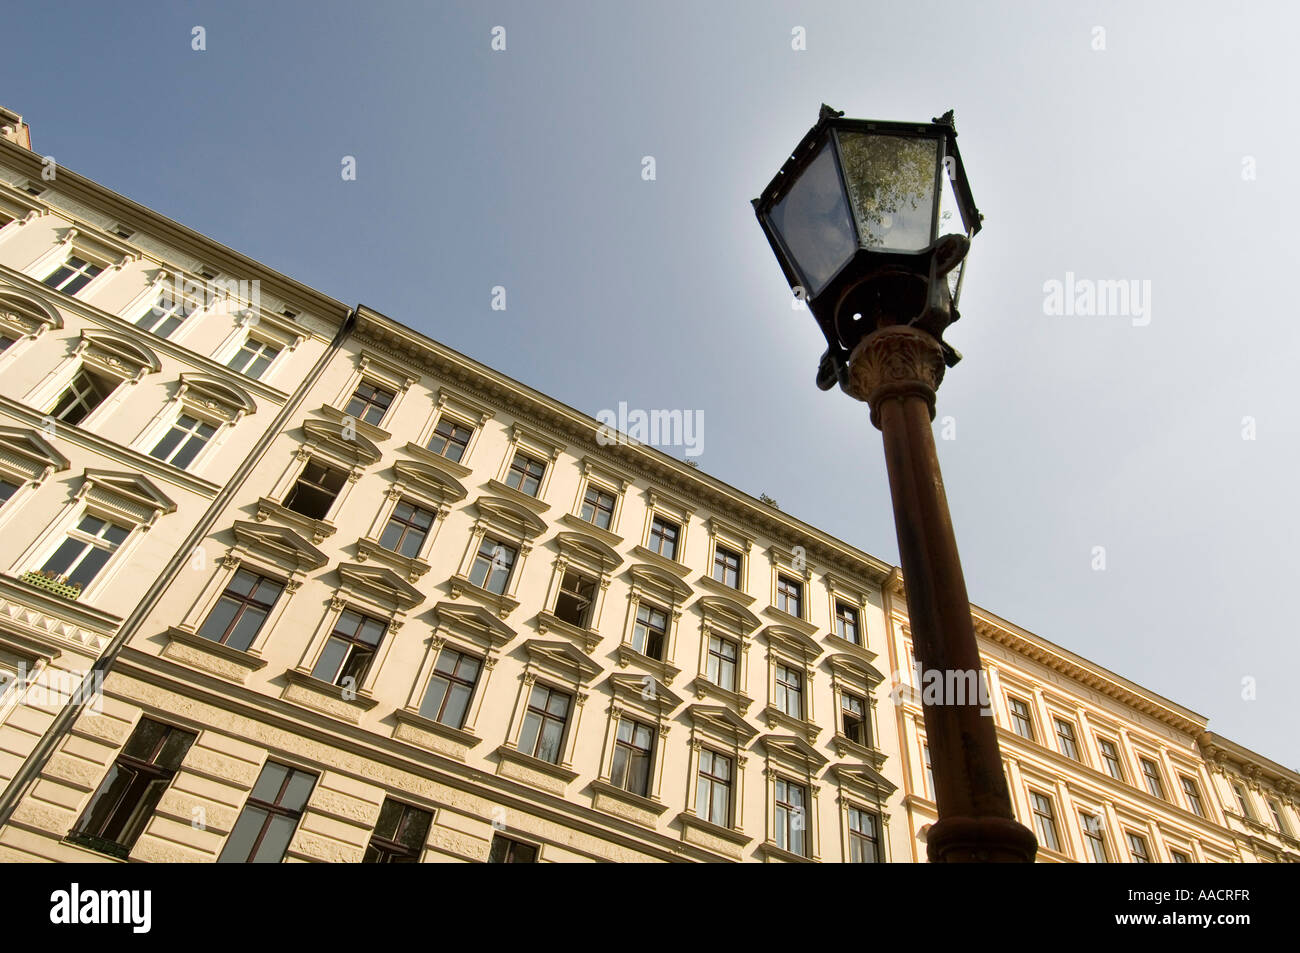 Facades of old buildings, Kreuzberg, Berlin, Germany - Stock Image